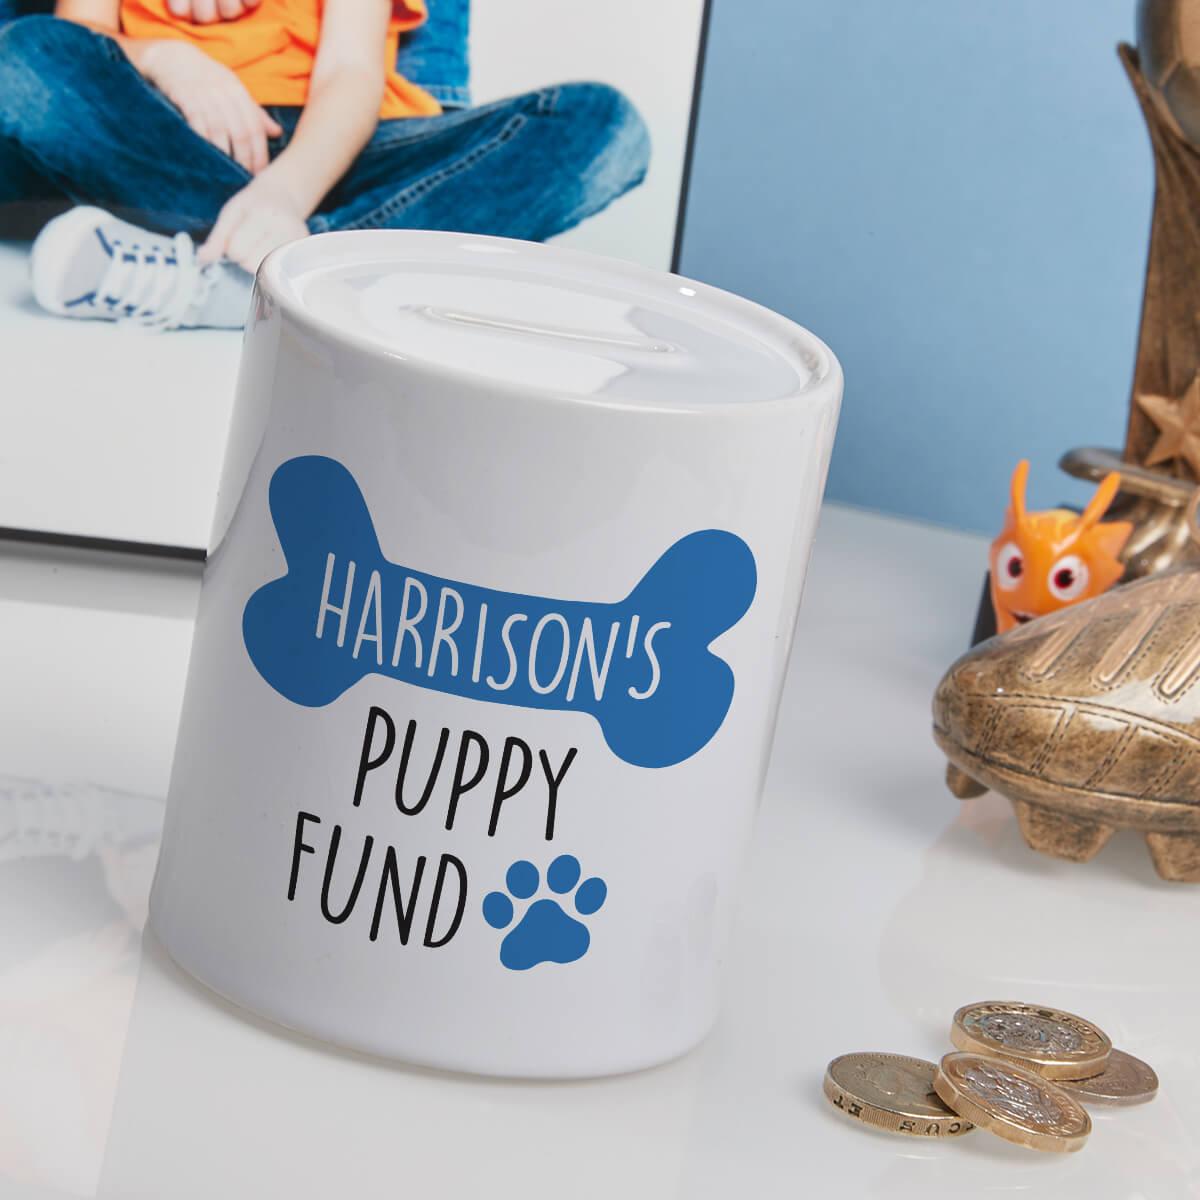 personalised blue puppy fund money box